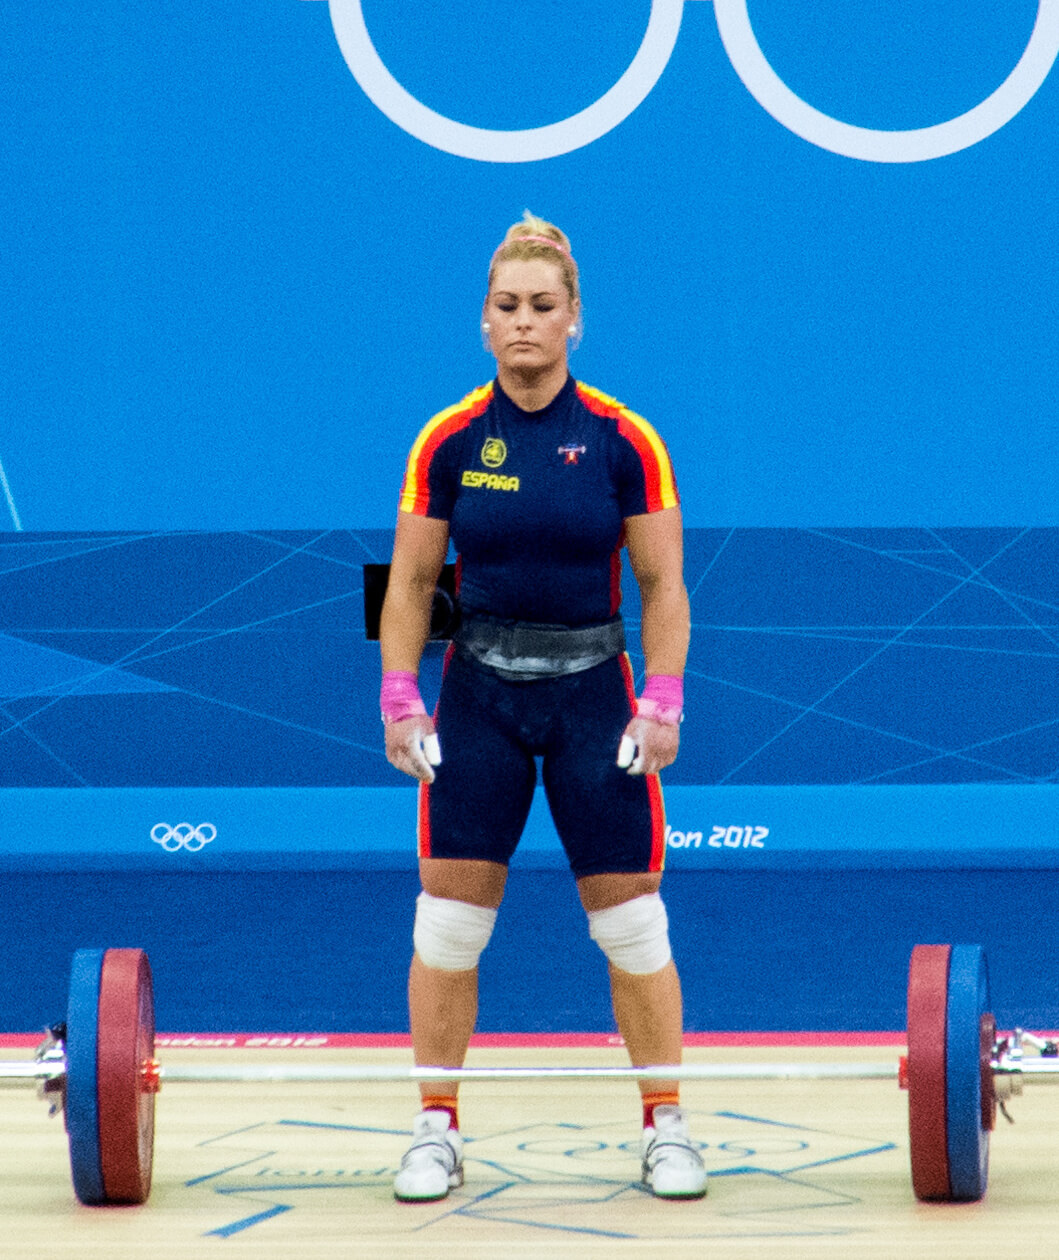 Lidia Valentin, weightlifter